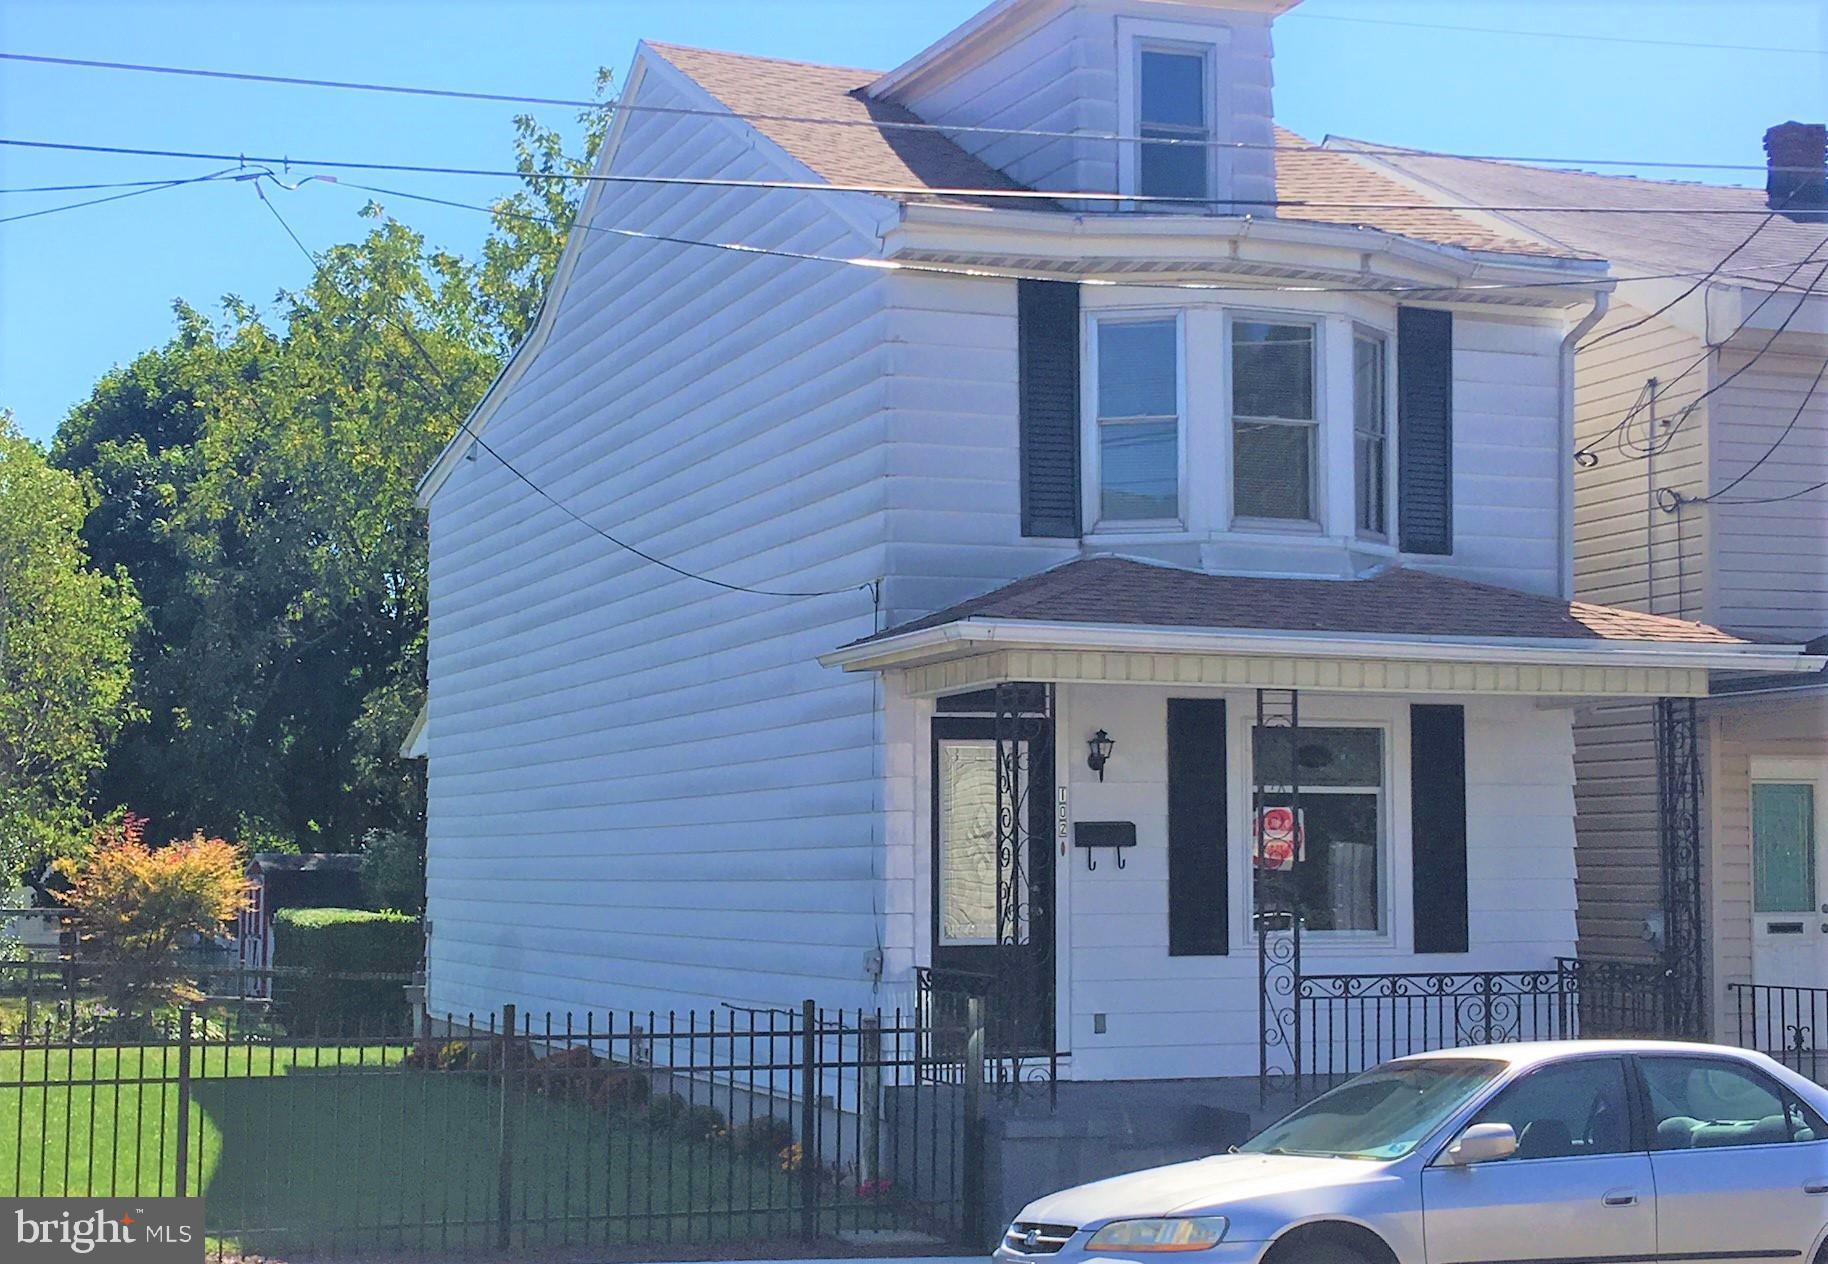 102 E FRANKLIN STREET, SAINT CLAIR, PA 17970